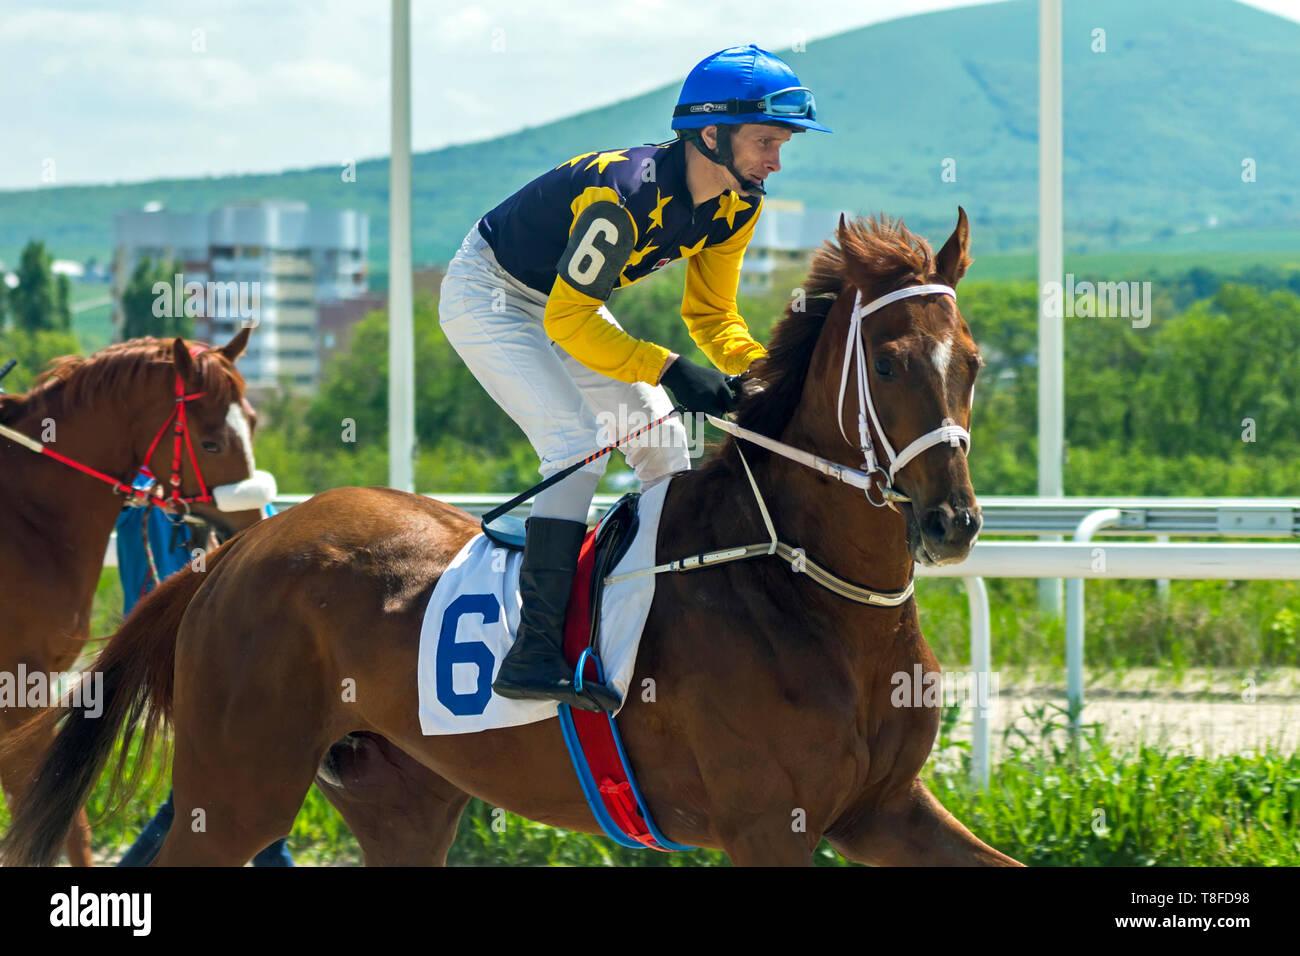 Horse racing in Pyatigorsk,Caucasus,Rusia. - Stock Image